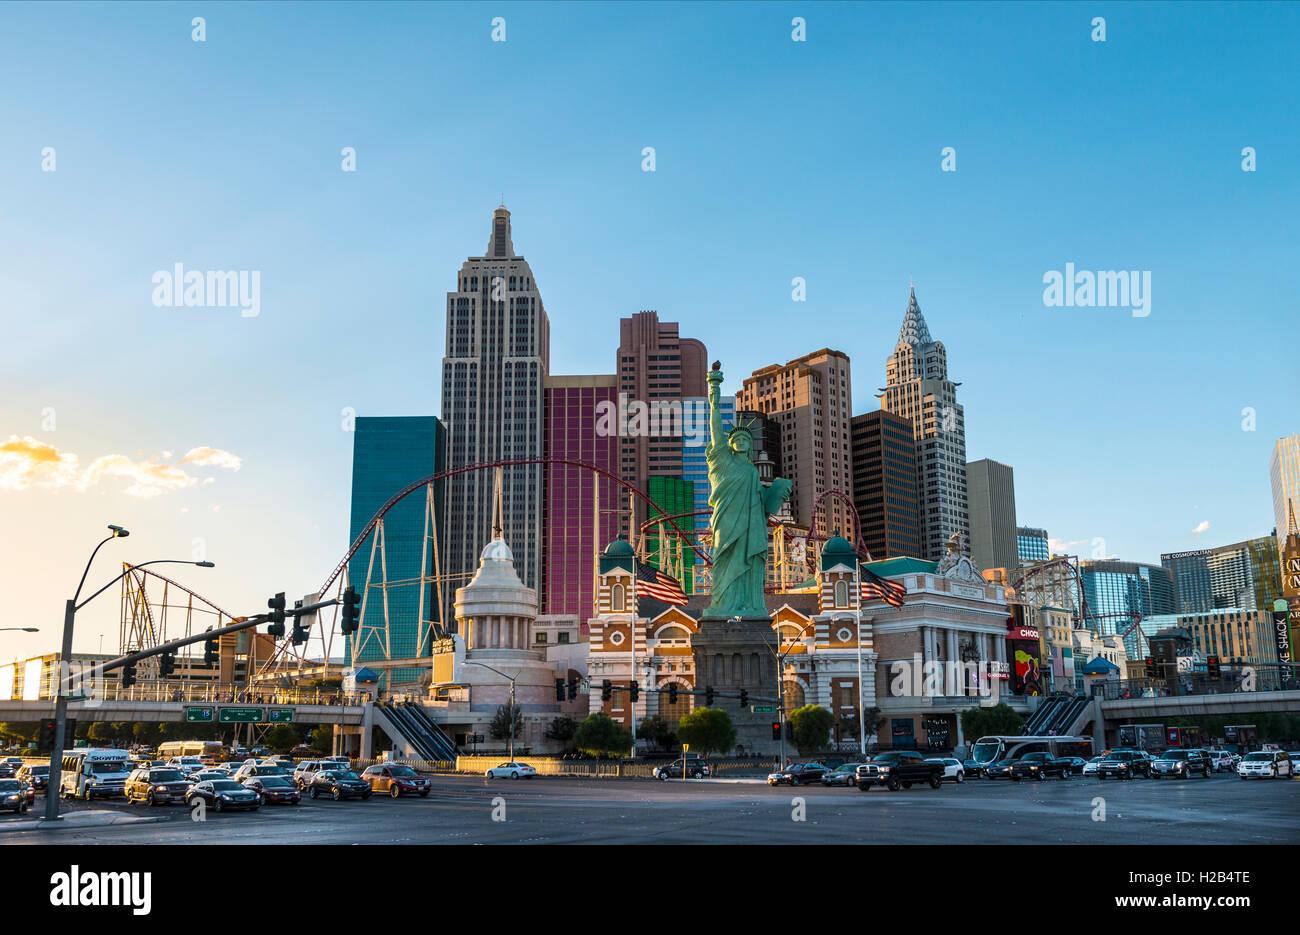 New York New York Hotel and Casino, Las Vegas, Nevada, USA Stock Photo